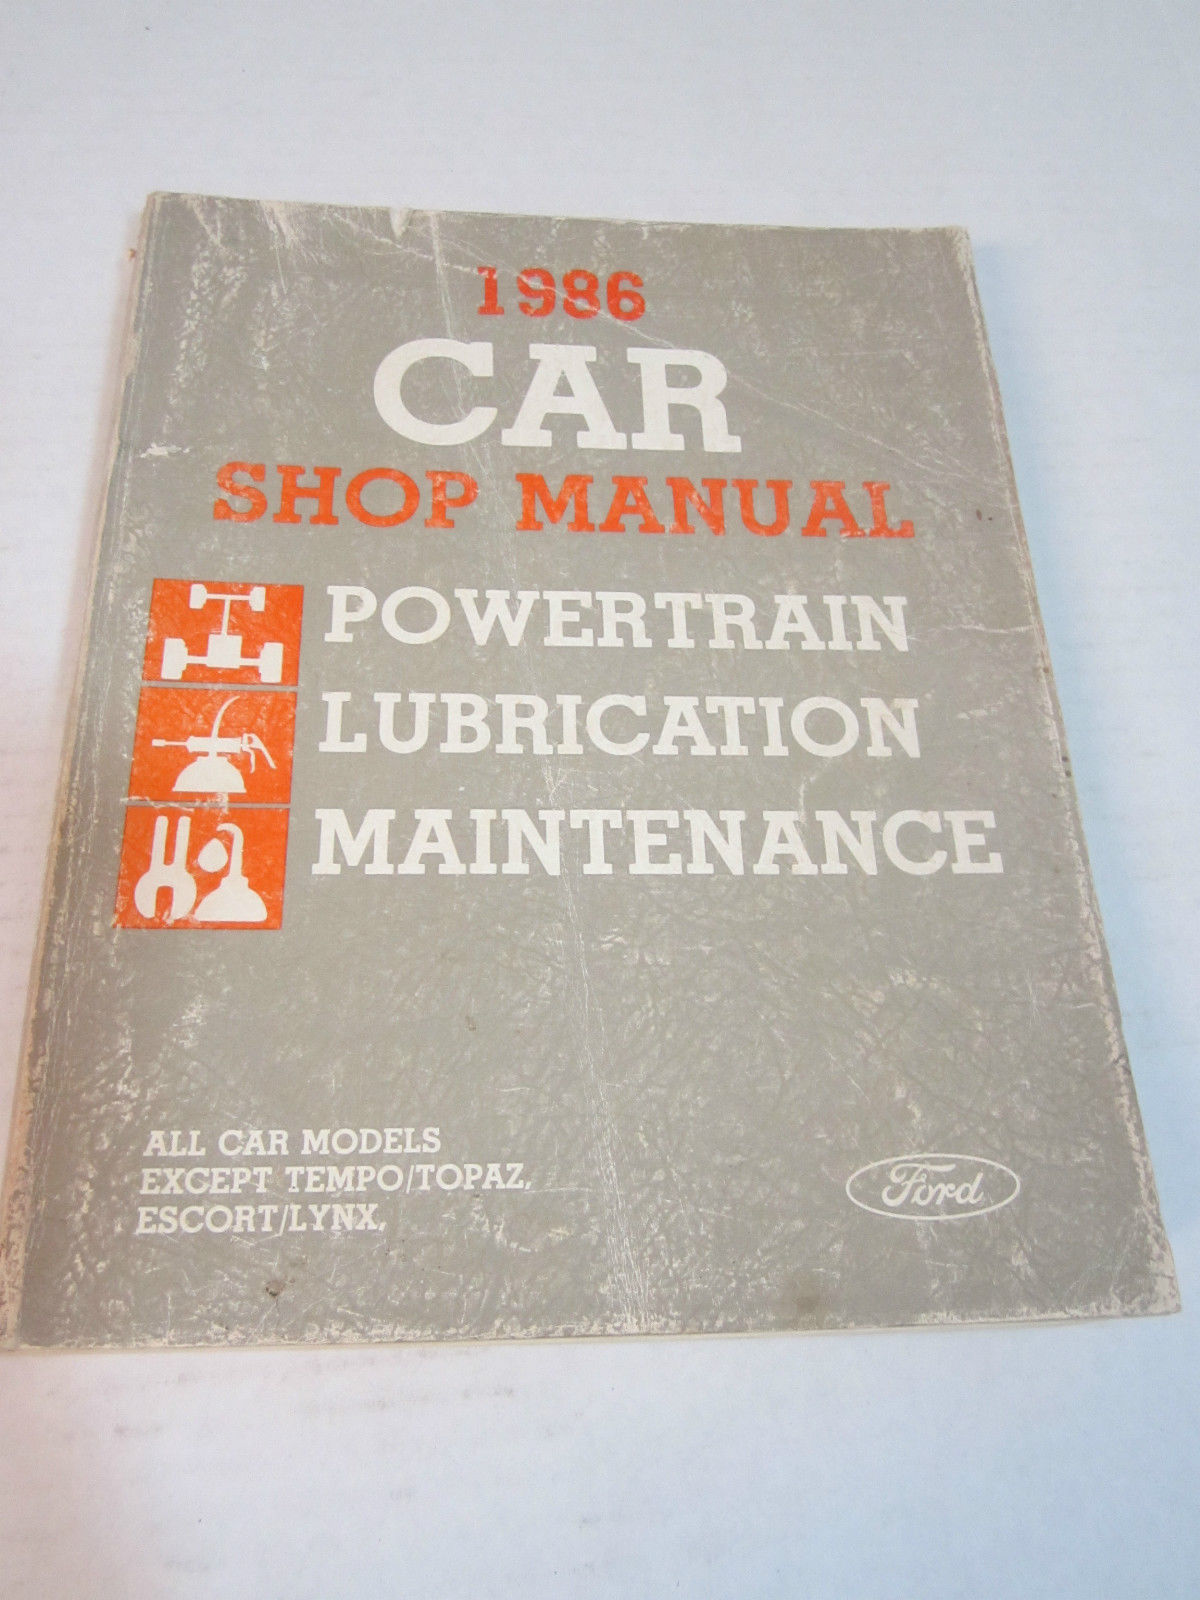 ... 1986 Ford Car Shop Manual - Powertrain/Lubrication/Maintenance - (D)